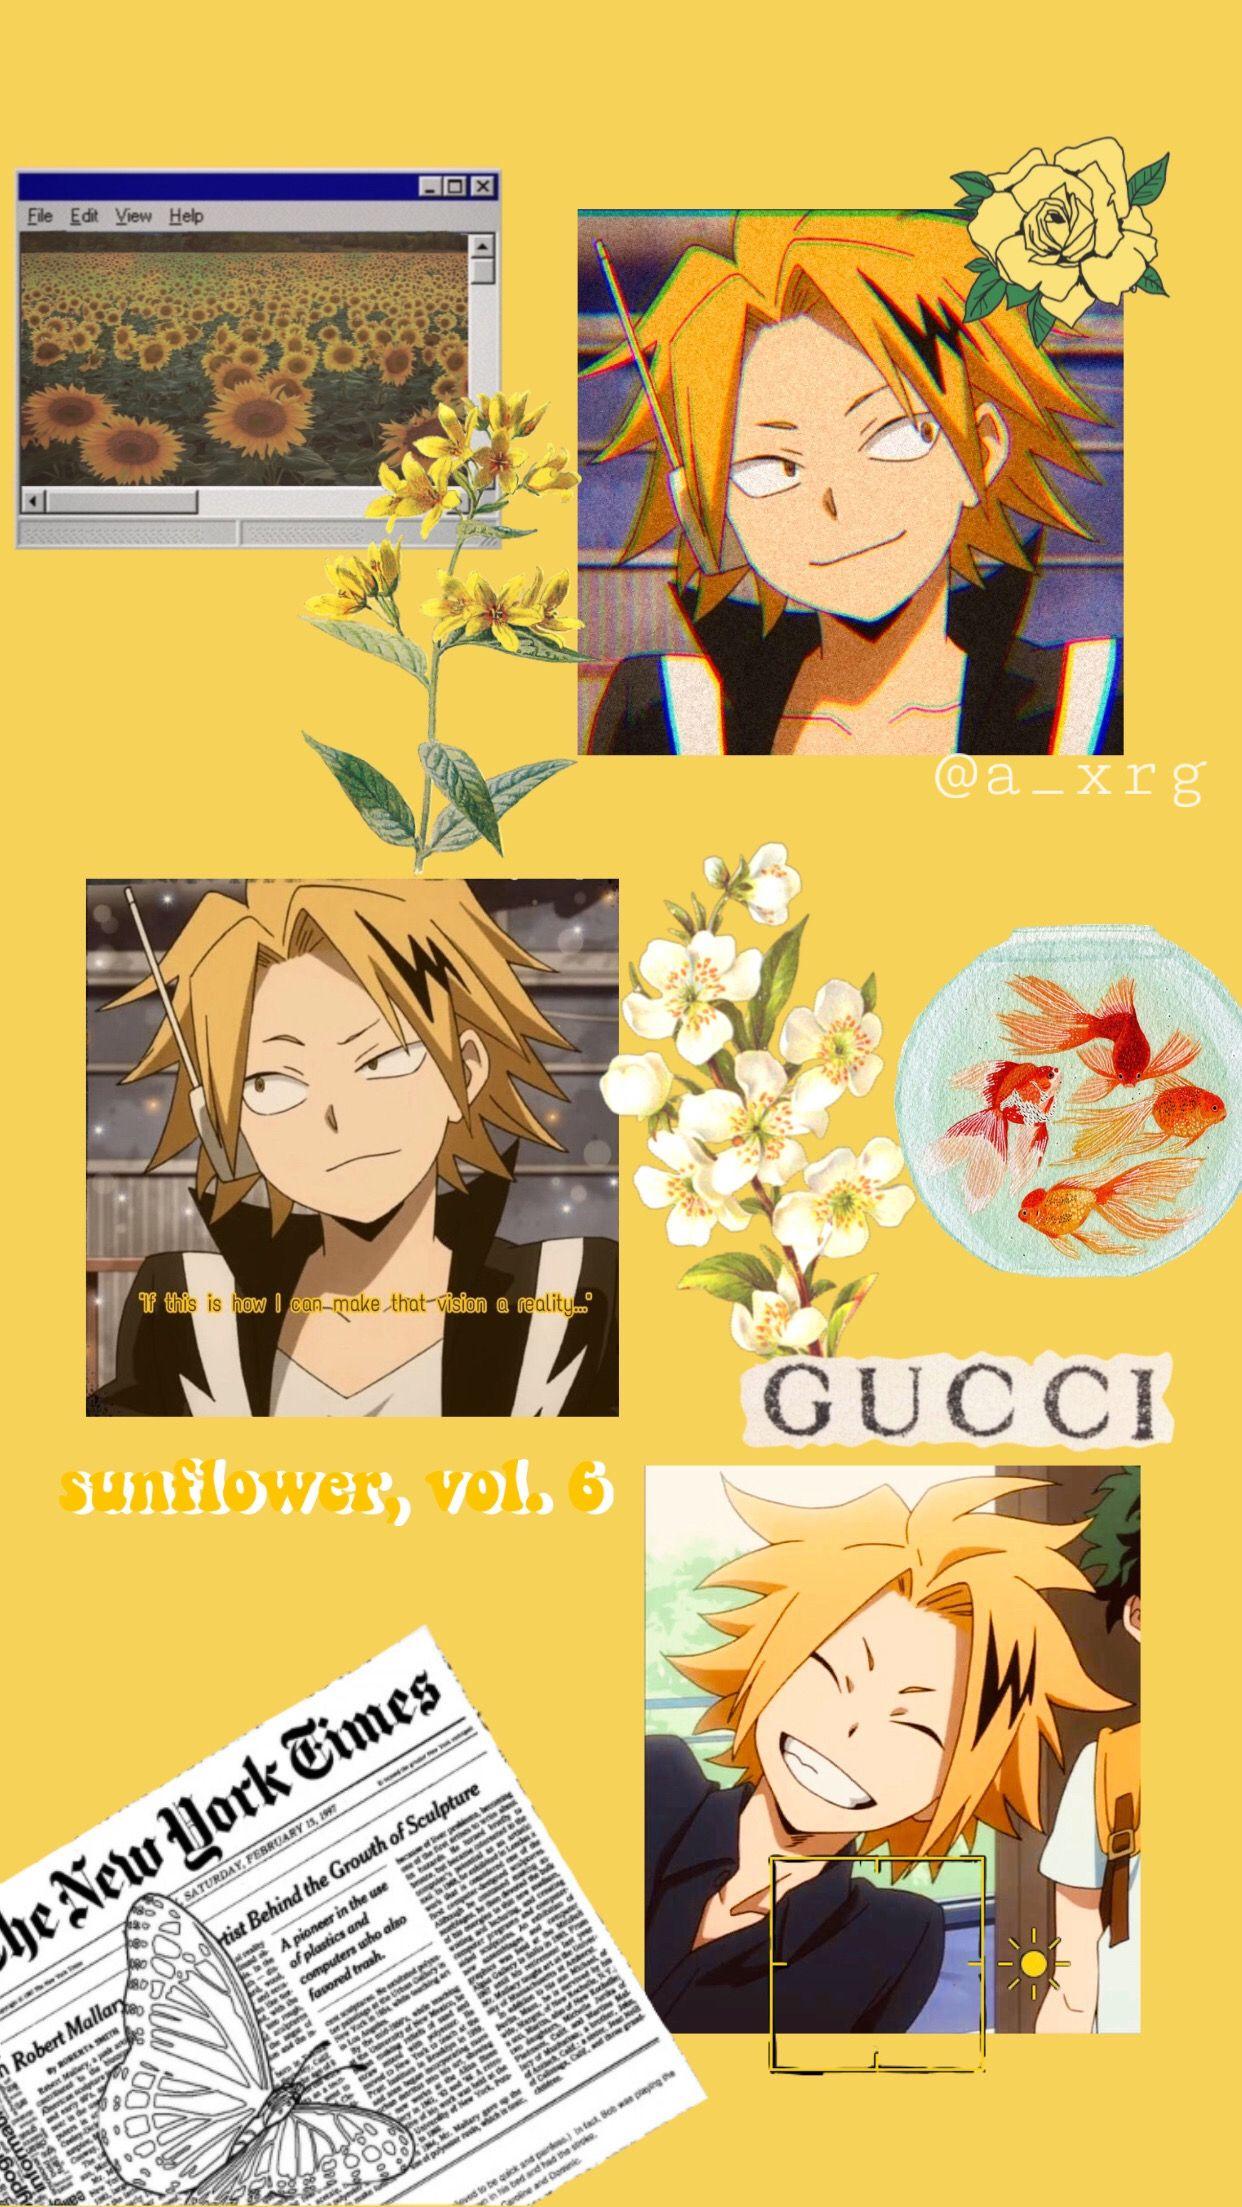 Denki Kaminari Aesthetic Anime Cute Anime Wallpaper Anime Wallpaper Live Boku no hero academia, midoriya izuku, izuku midoriya, uraraka ochako, tsuyu asui, momo yaoyorozu. denki kaminari aesthetic anime cute